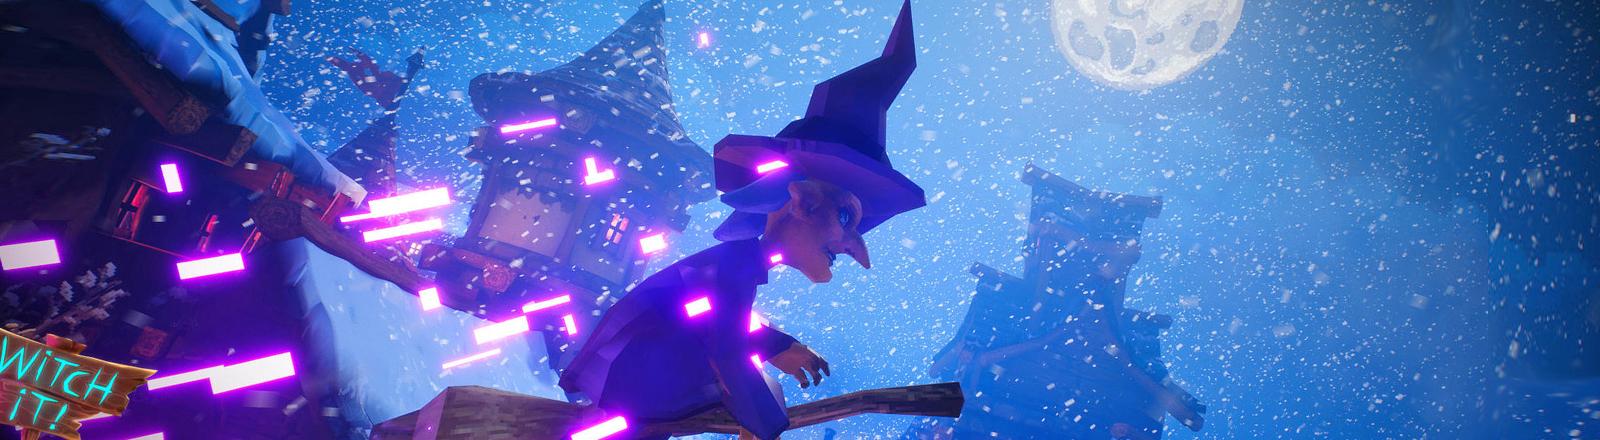 "Screenshot aus ""Witch It"""